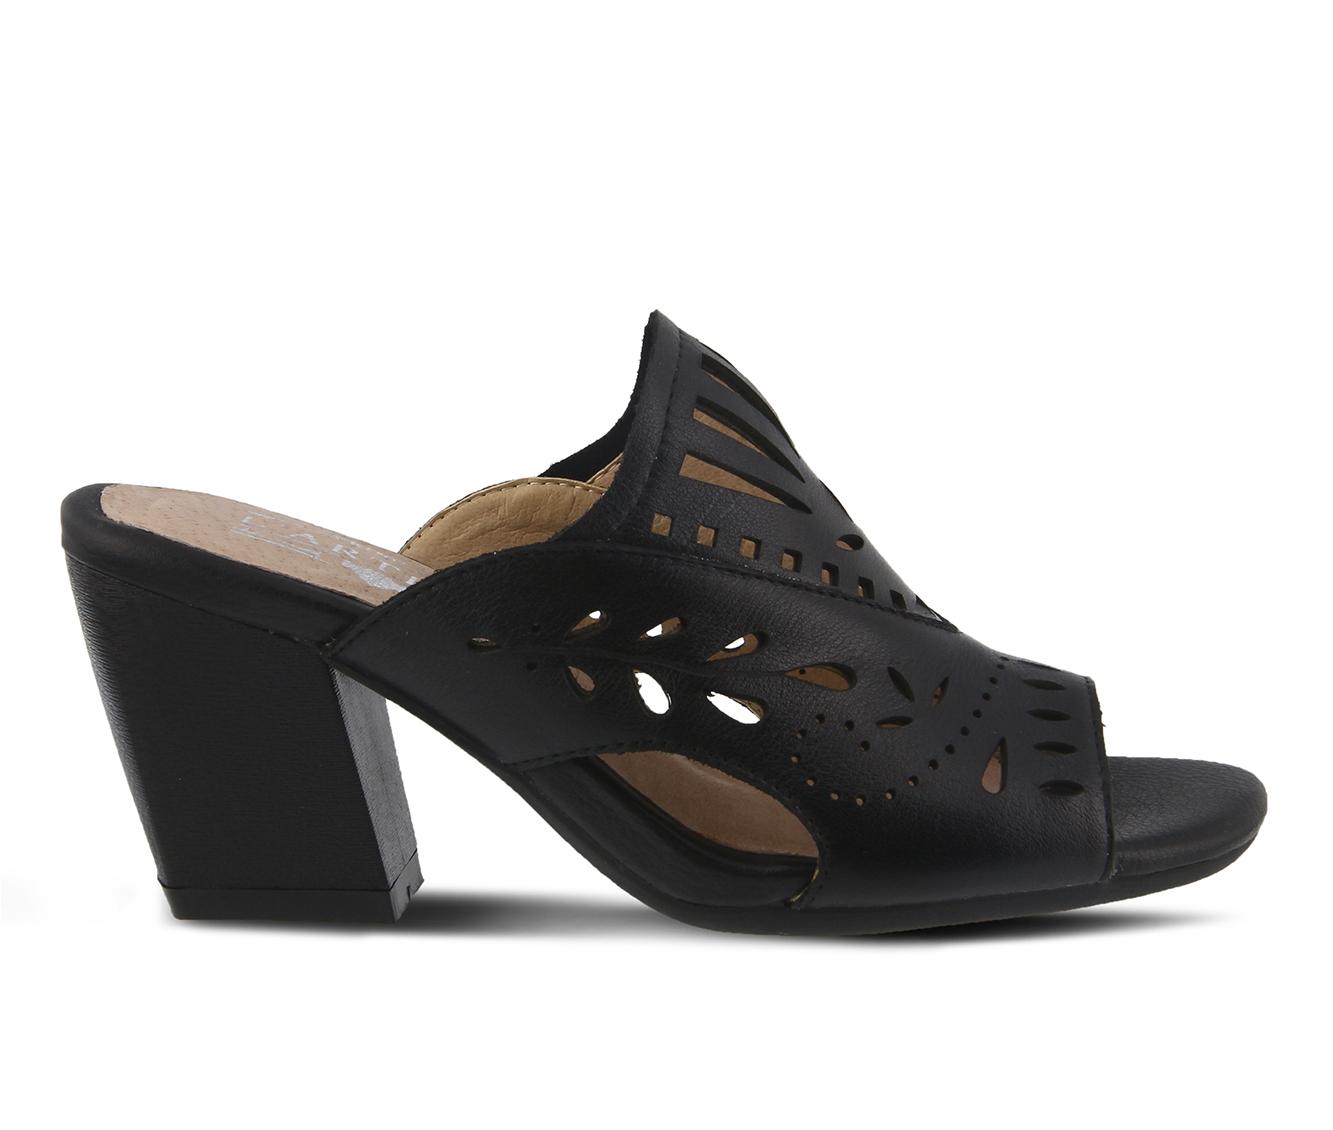 L'Artiste Zyzana Women's Dress Shoe (Black Leather)